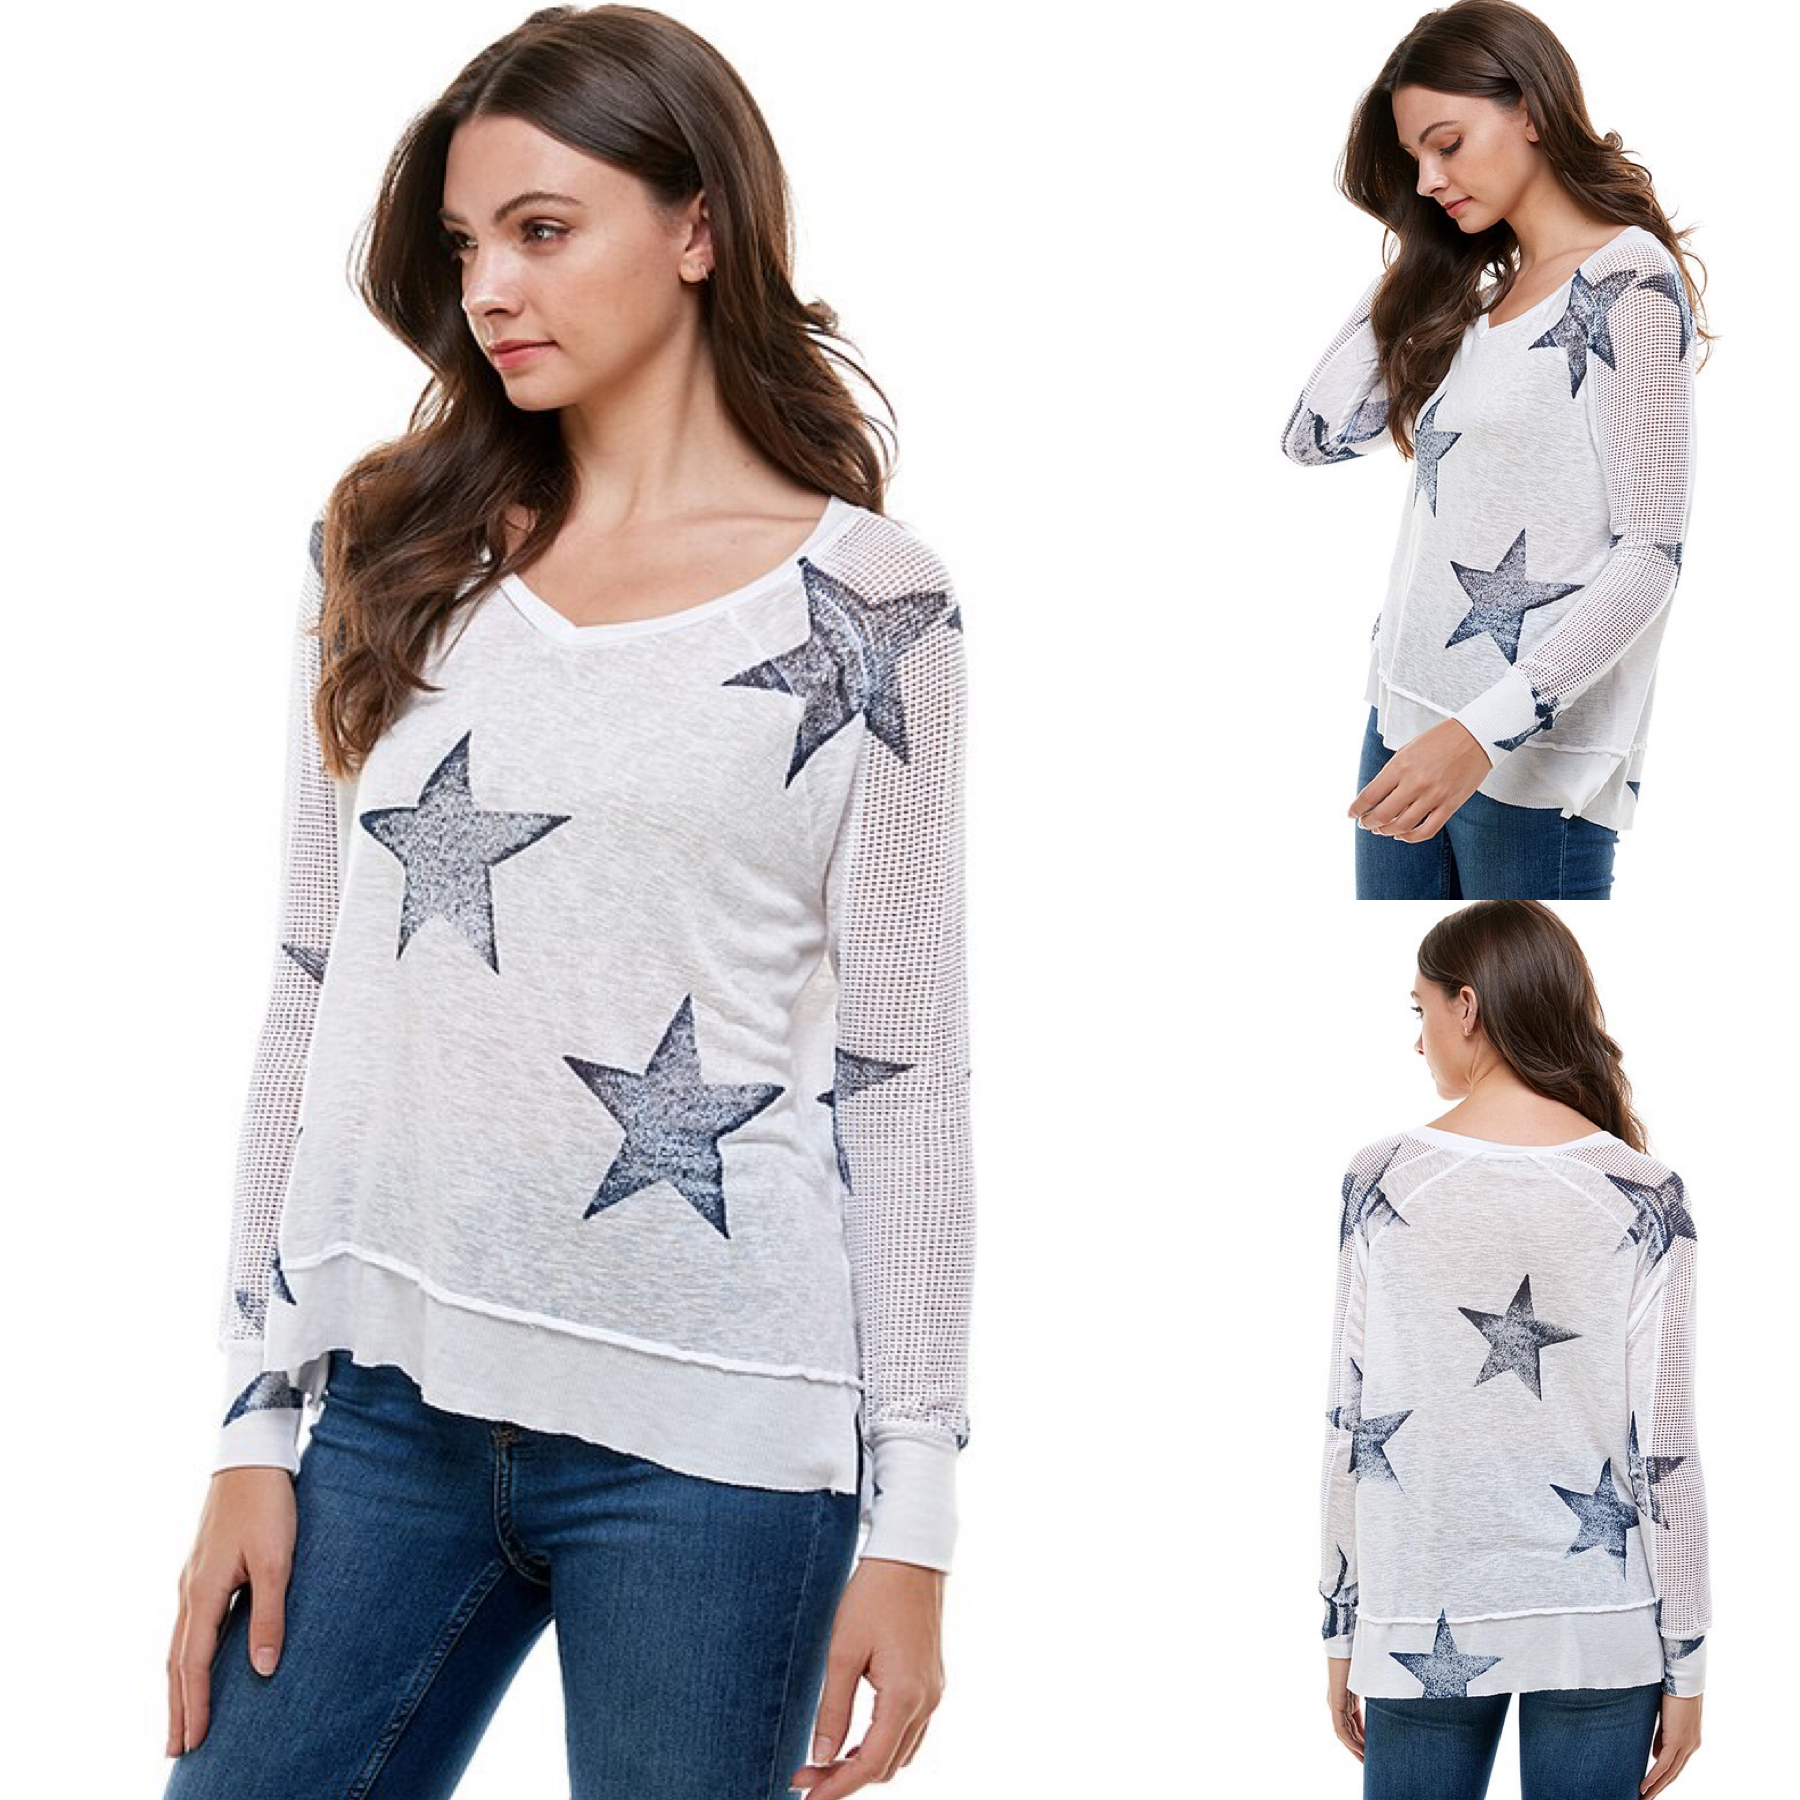 Fishnet Sleeve Star Print Top